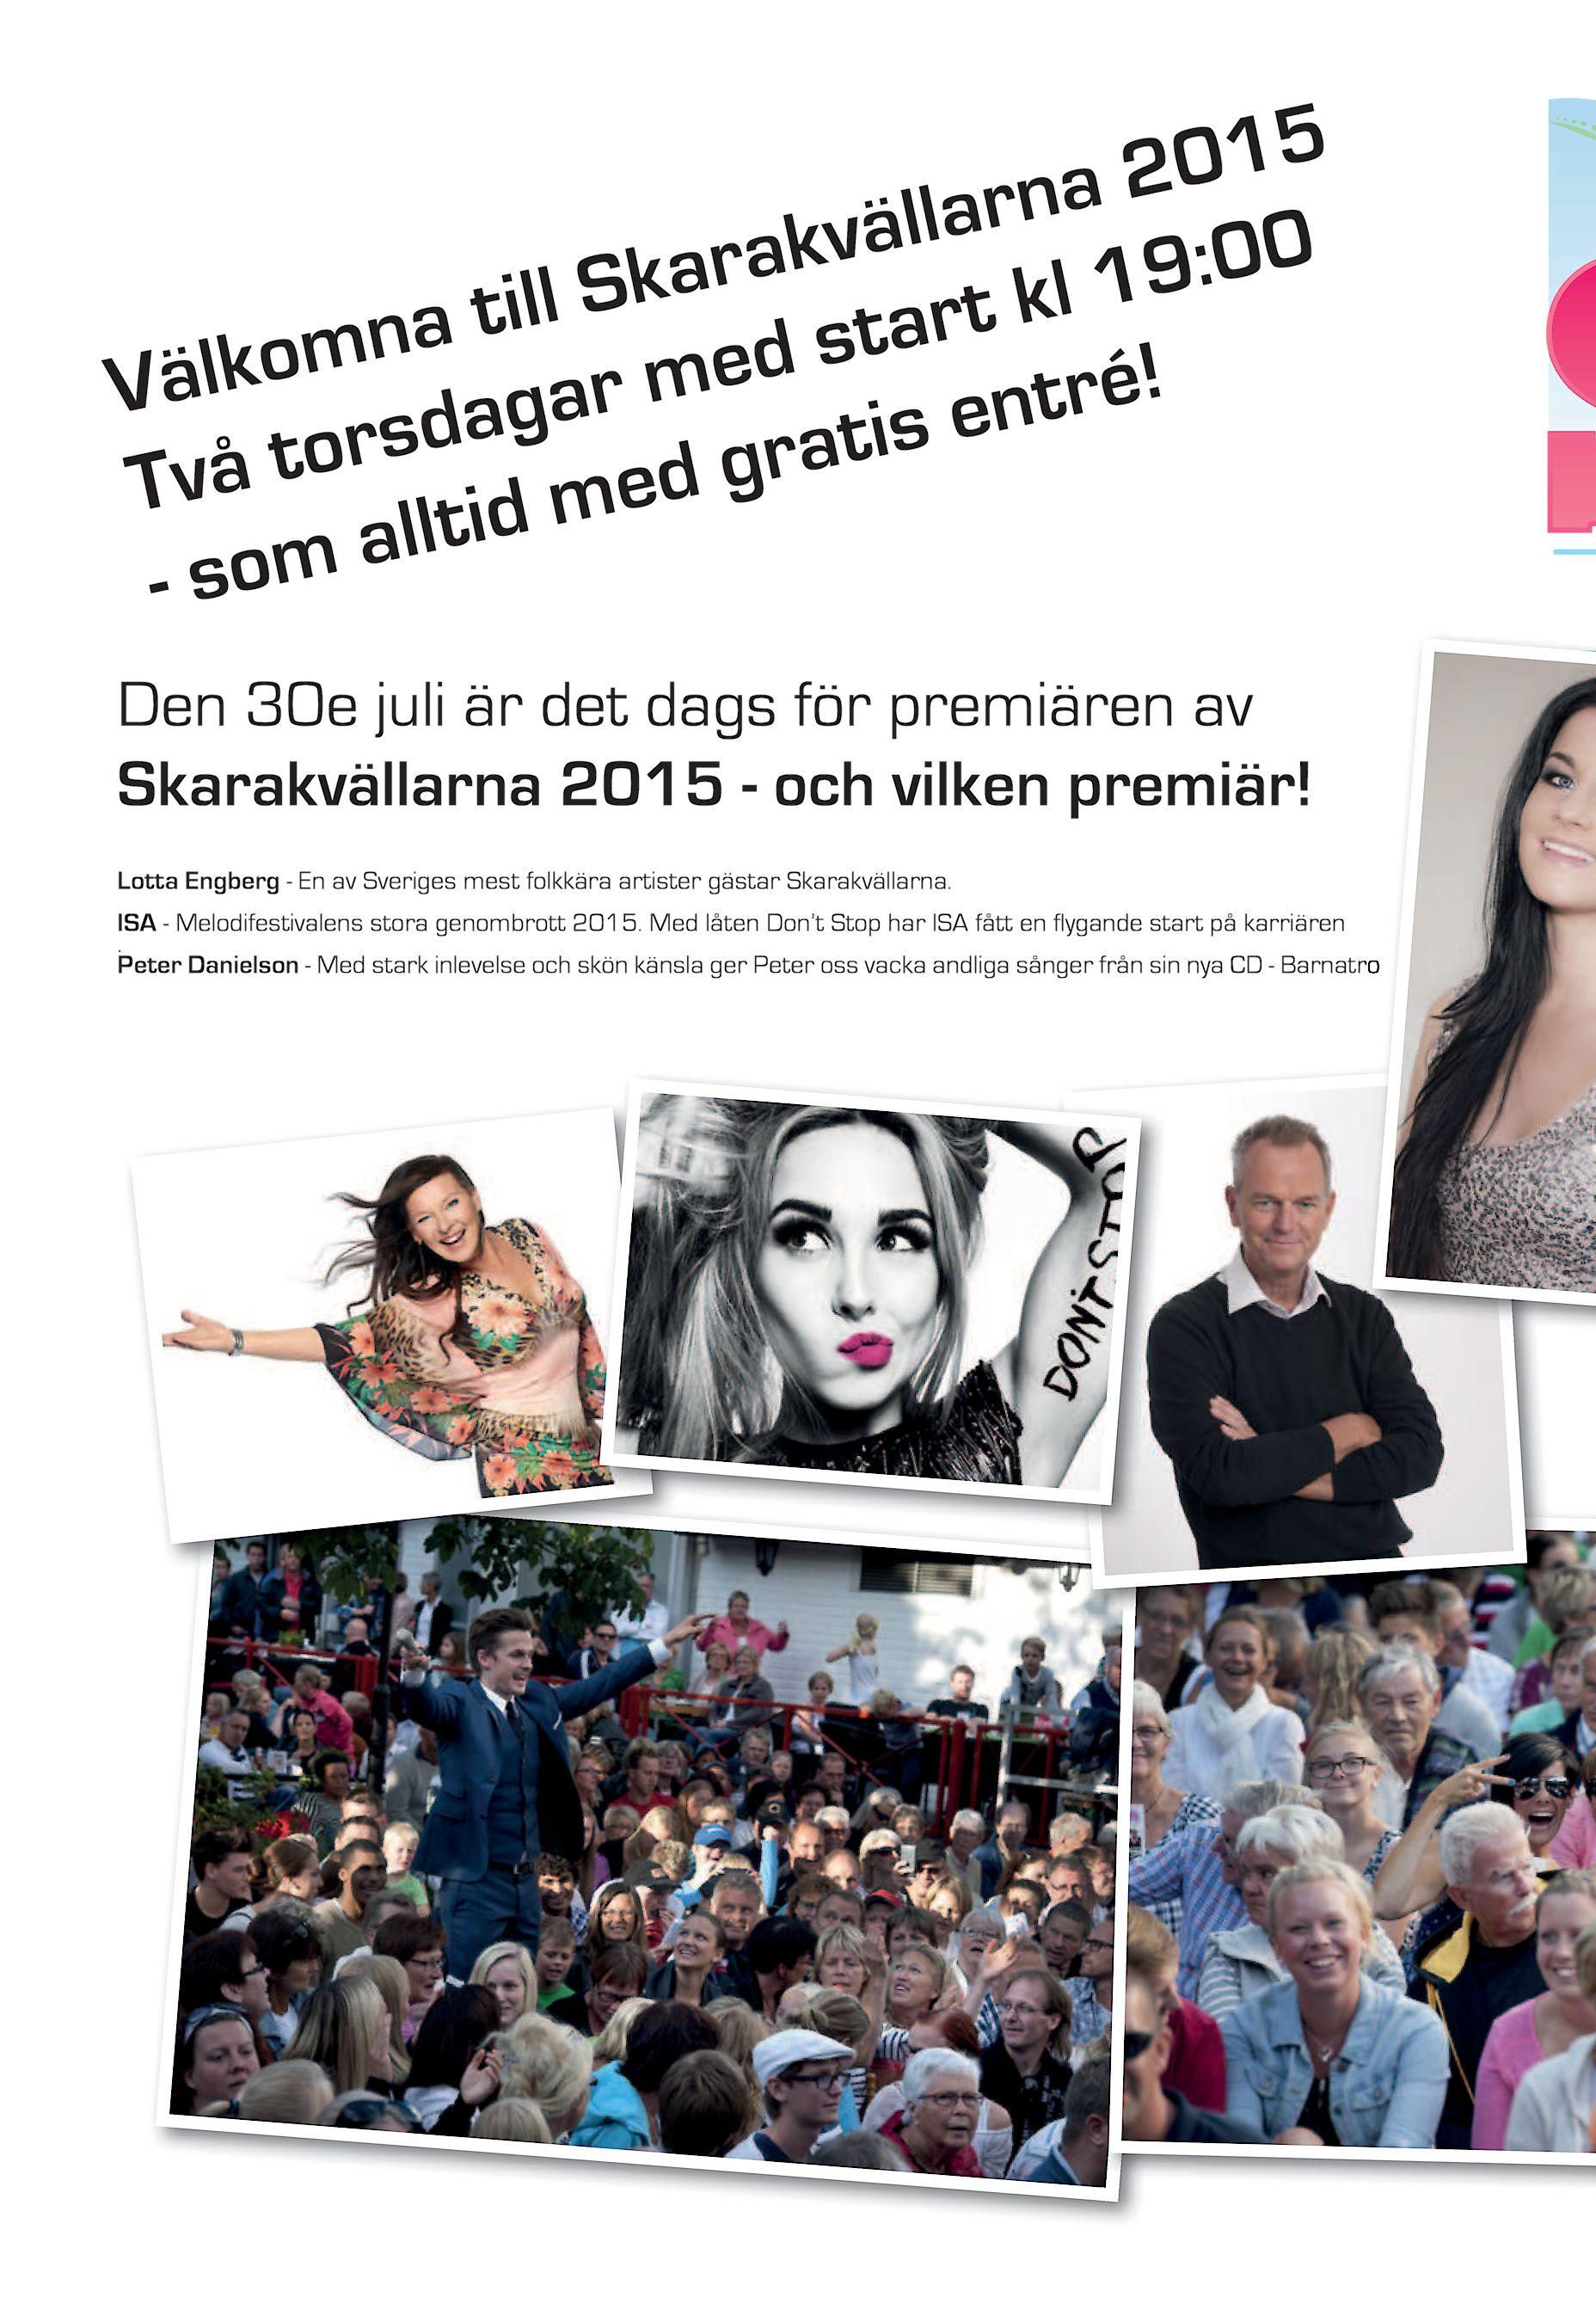 Tor nilsson demokratins medaljs baksida